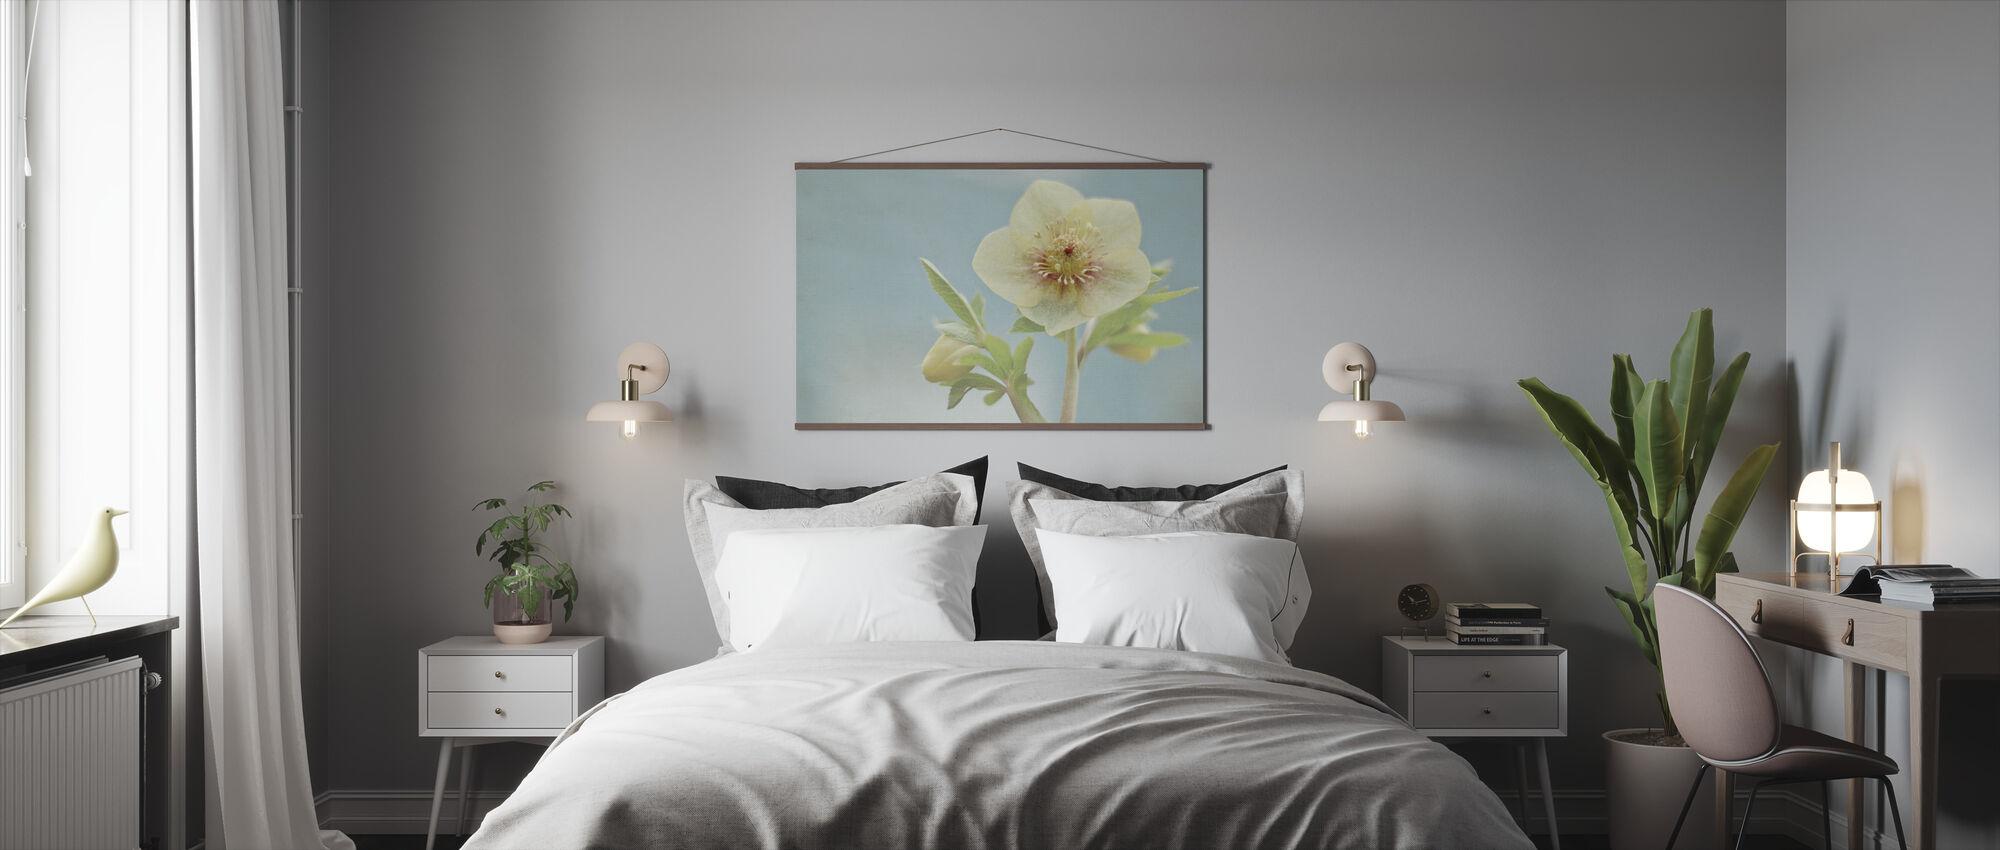 Heliotrope 2 - Poster - Bedroom